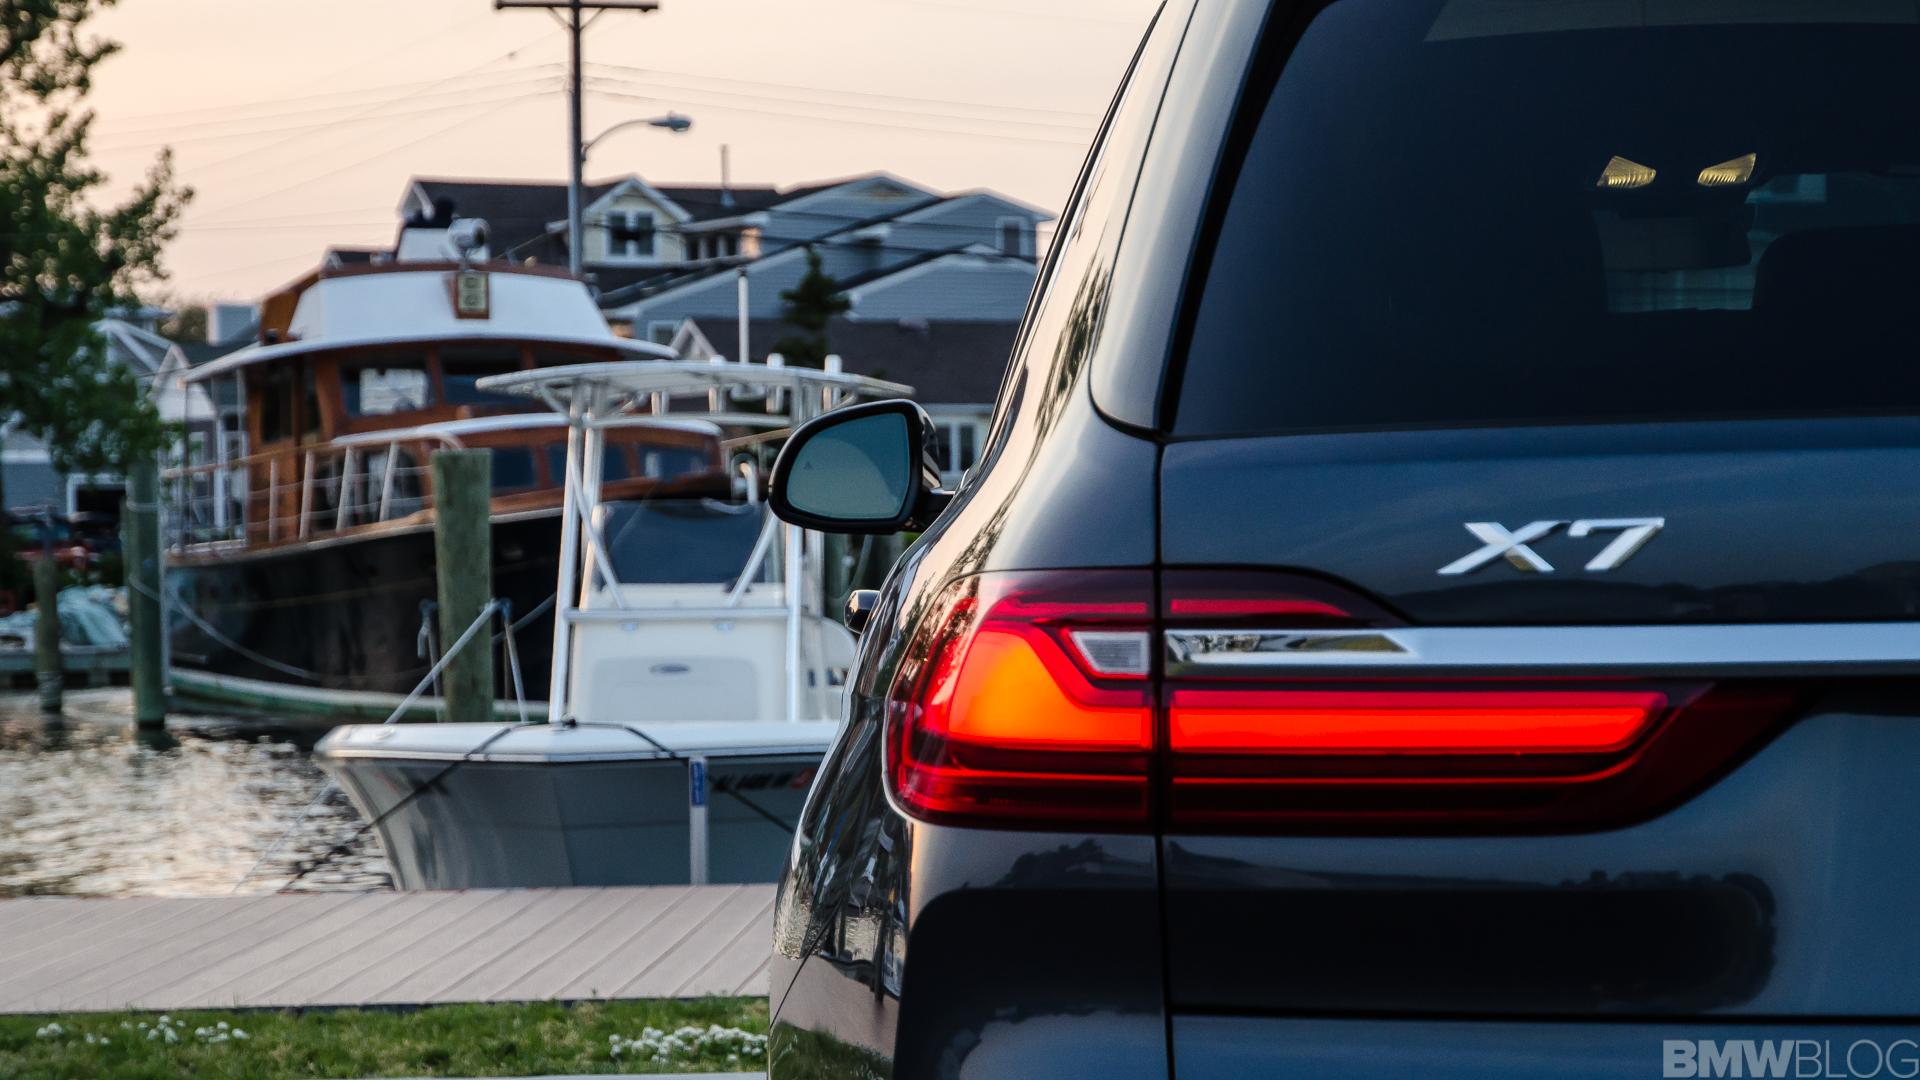 BMW X7 xDrive50i 32 of 71